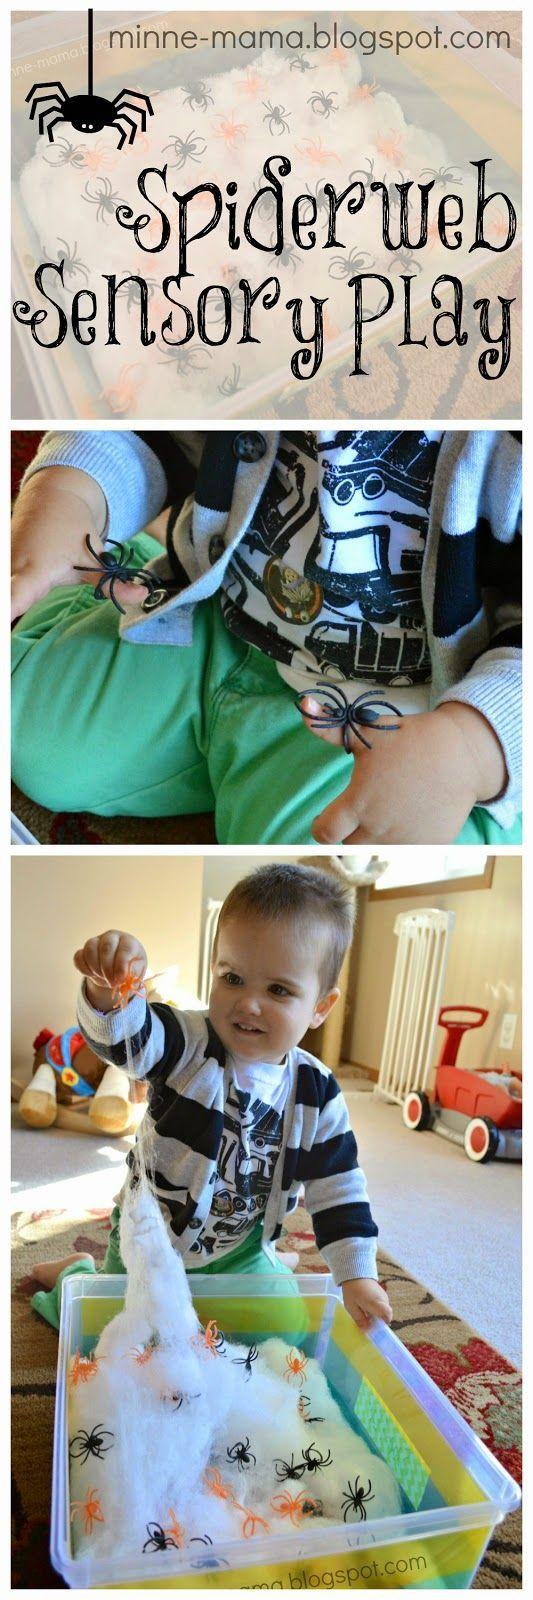 Minne-Mama: Spider Web Sensory Play